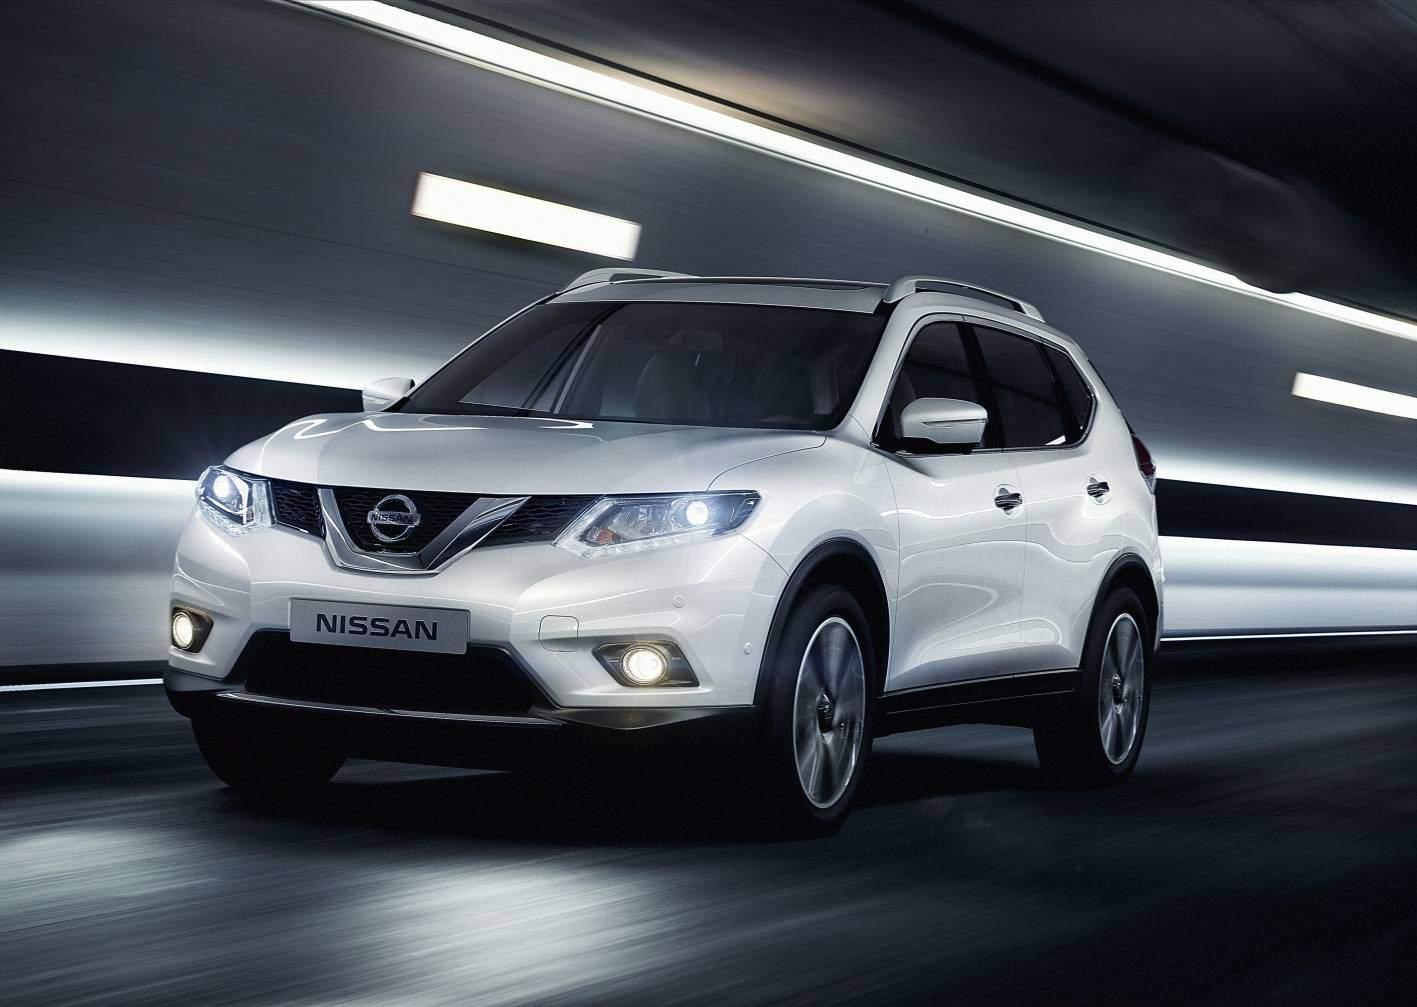 Next generation Nissan X-Trail unveiled